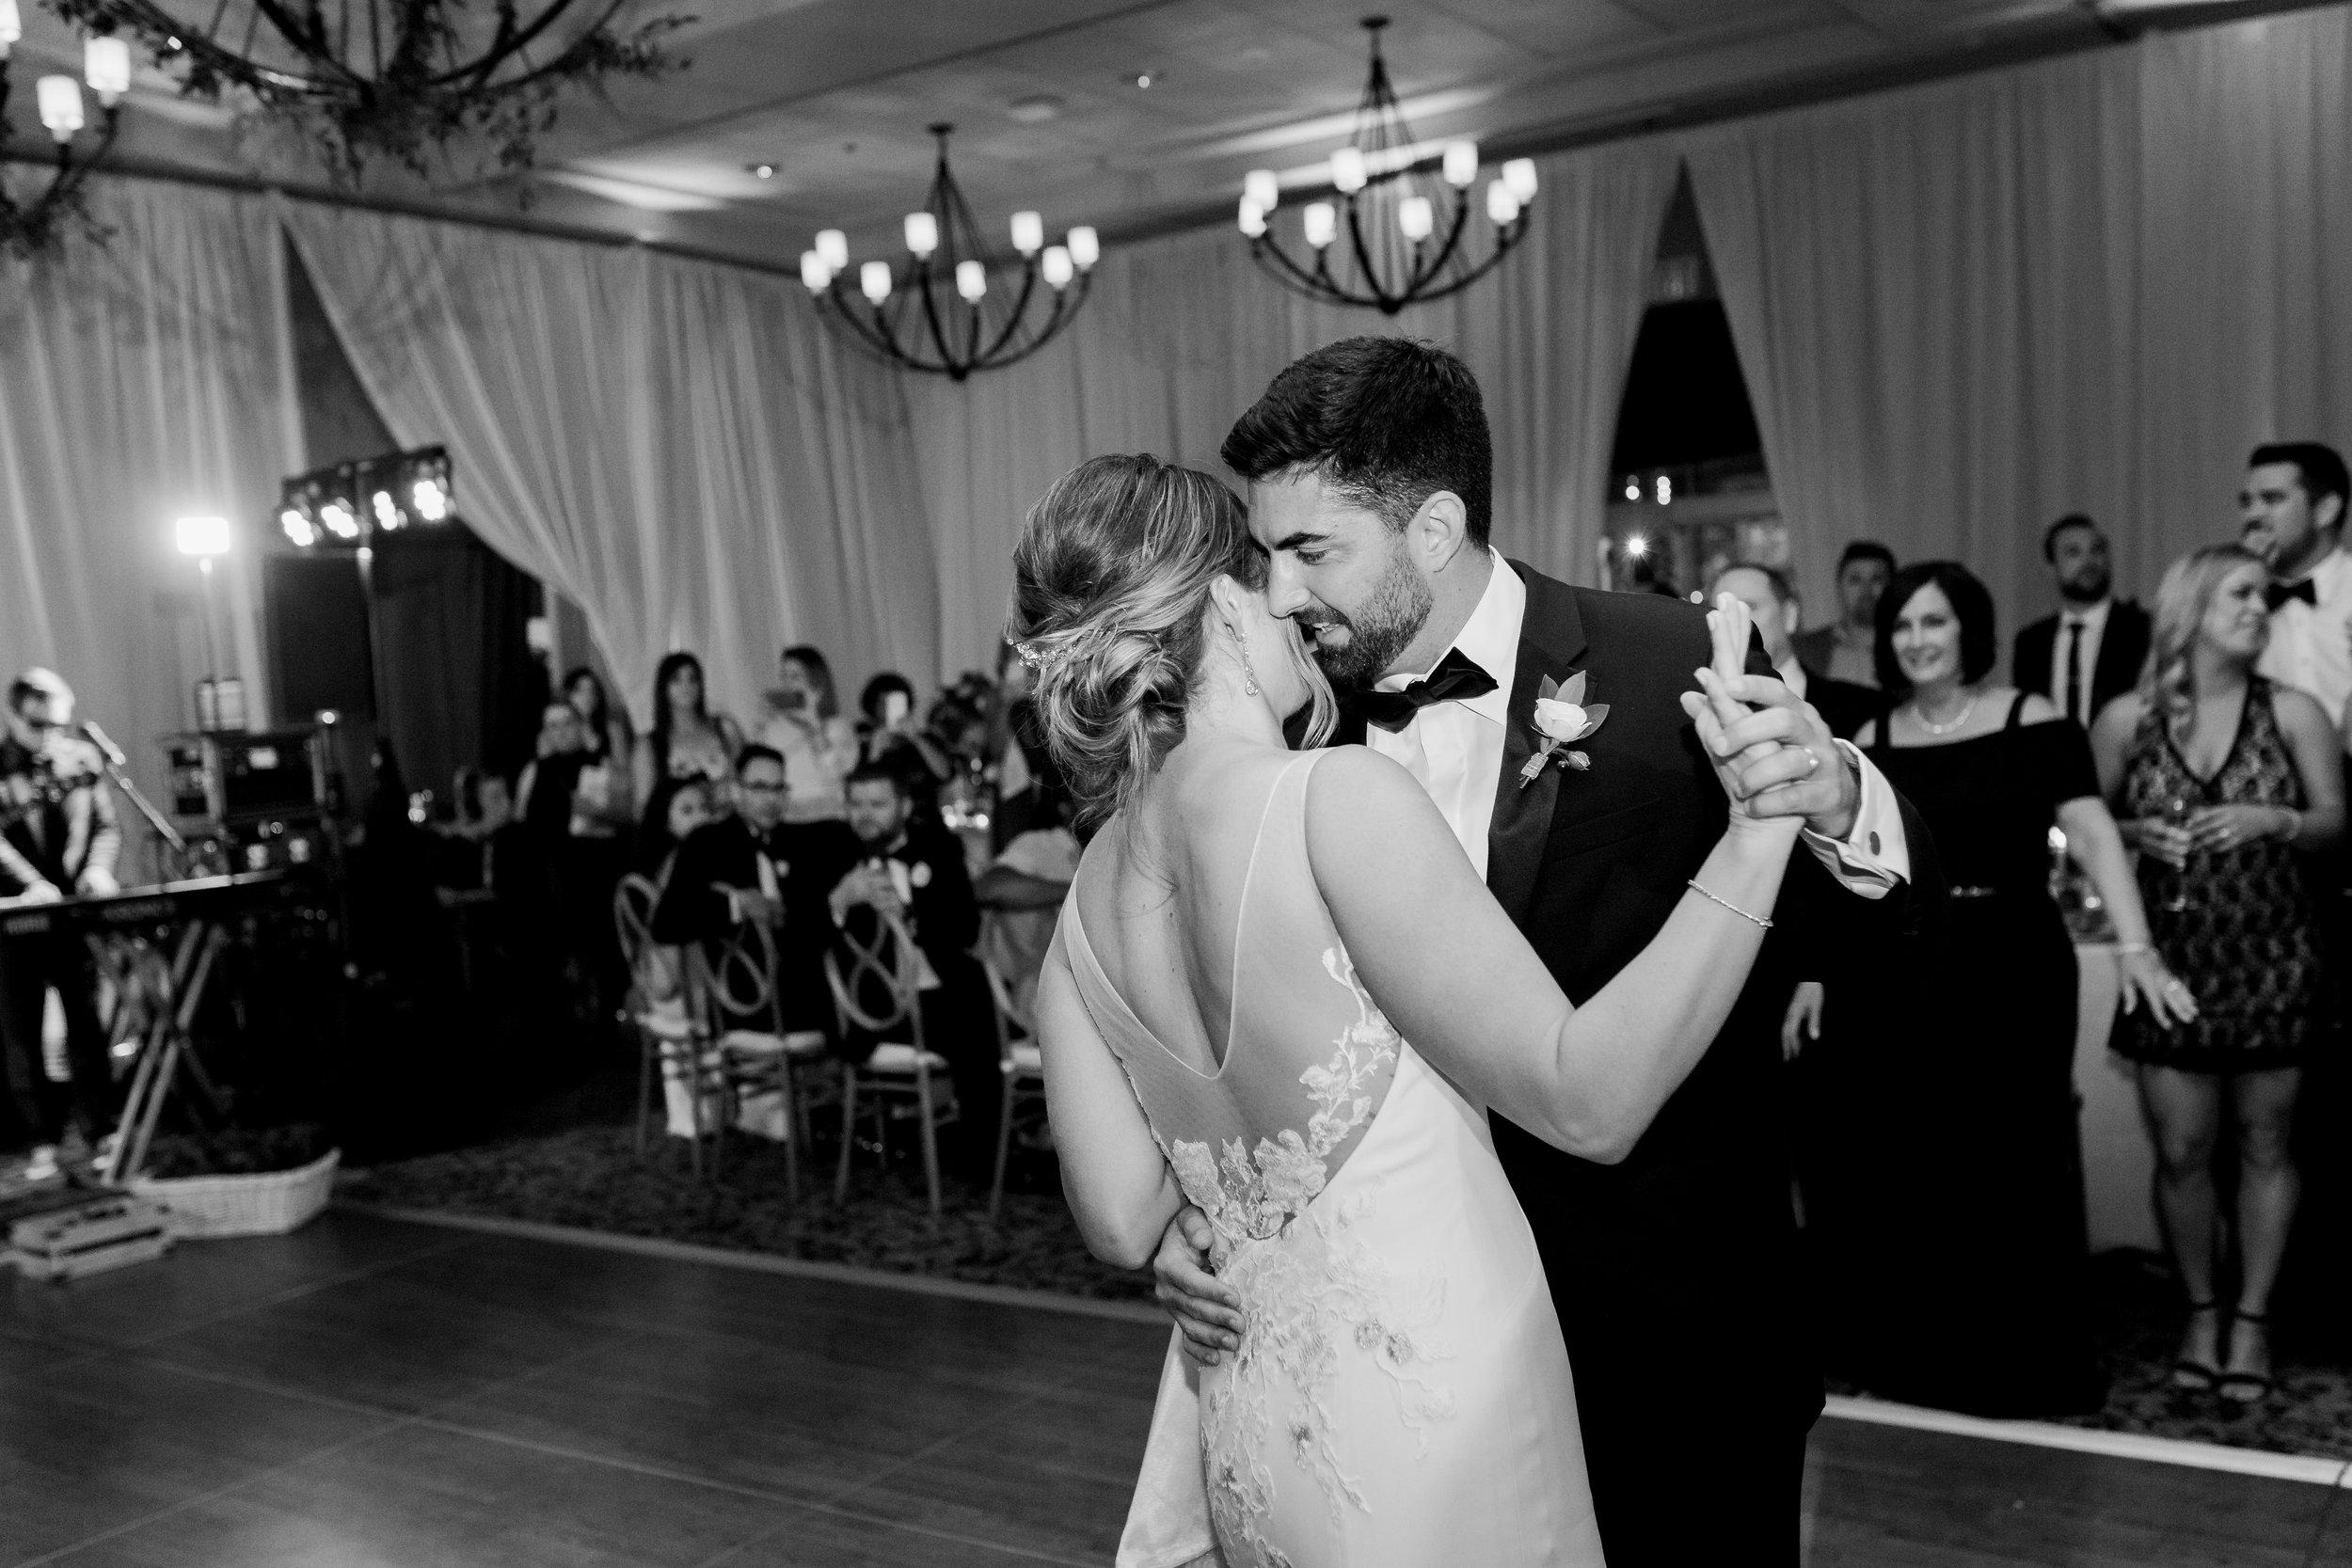 vintners-inn-wedding-in-santa-rosa-california-105.jpg